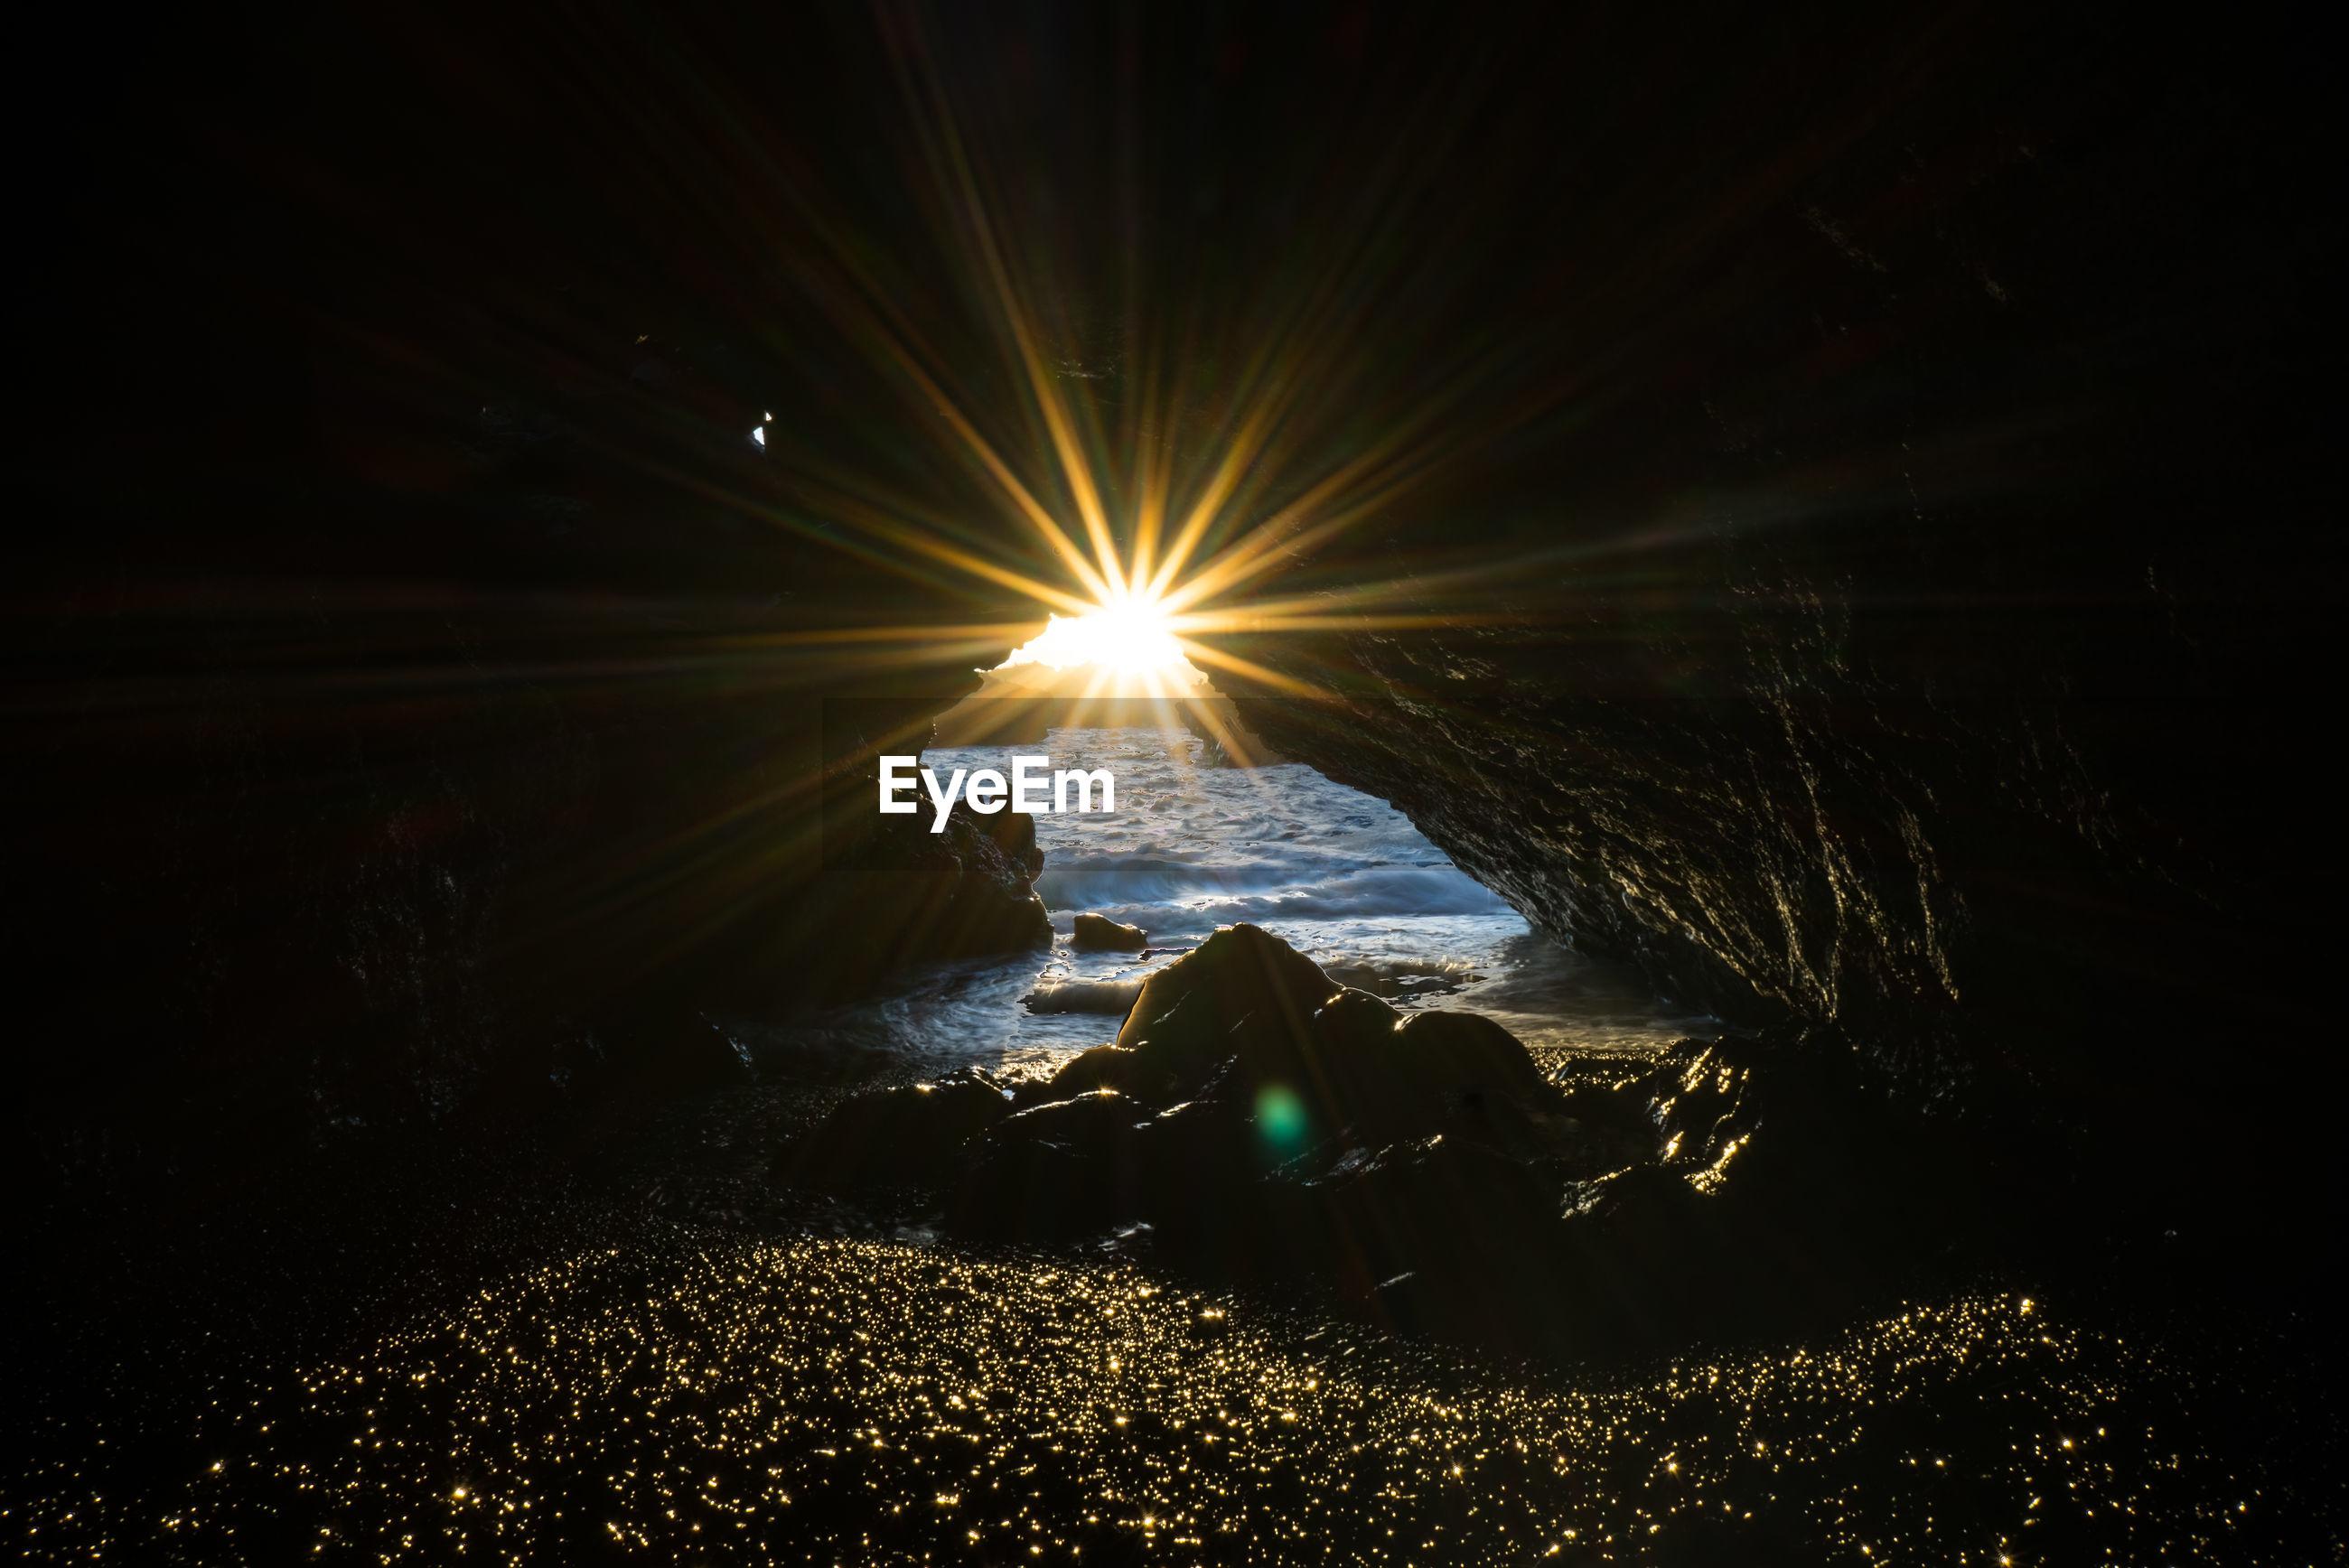 VIEW OF SEA AGAINST BRIGHT SUN